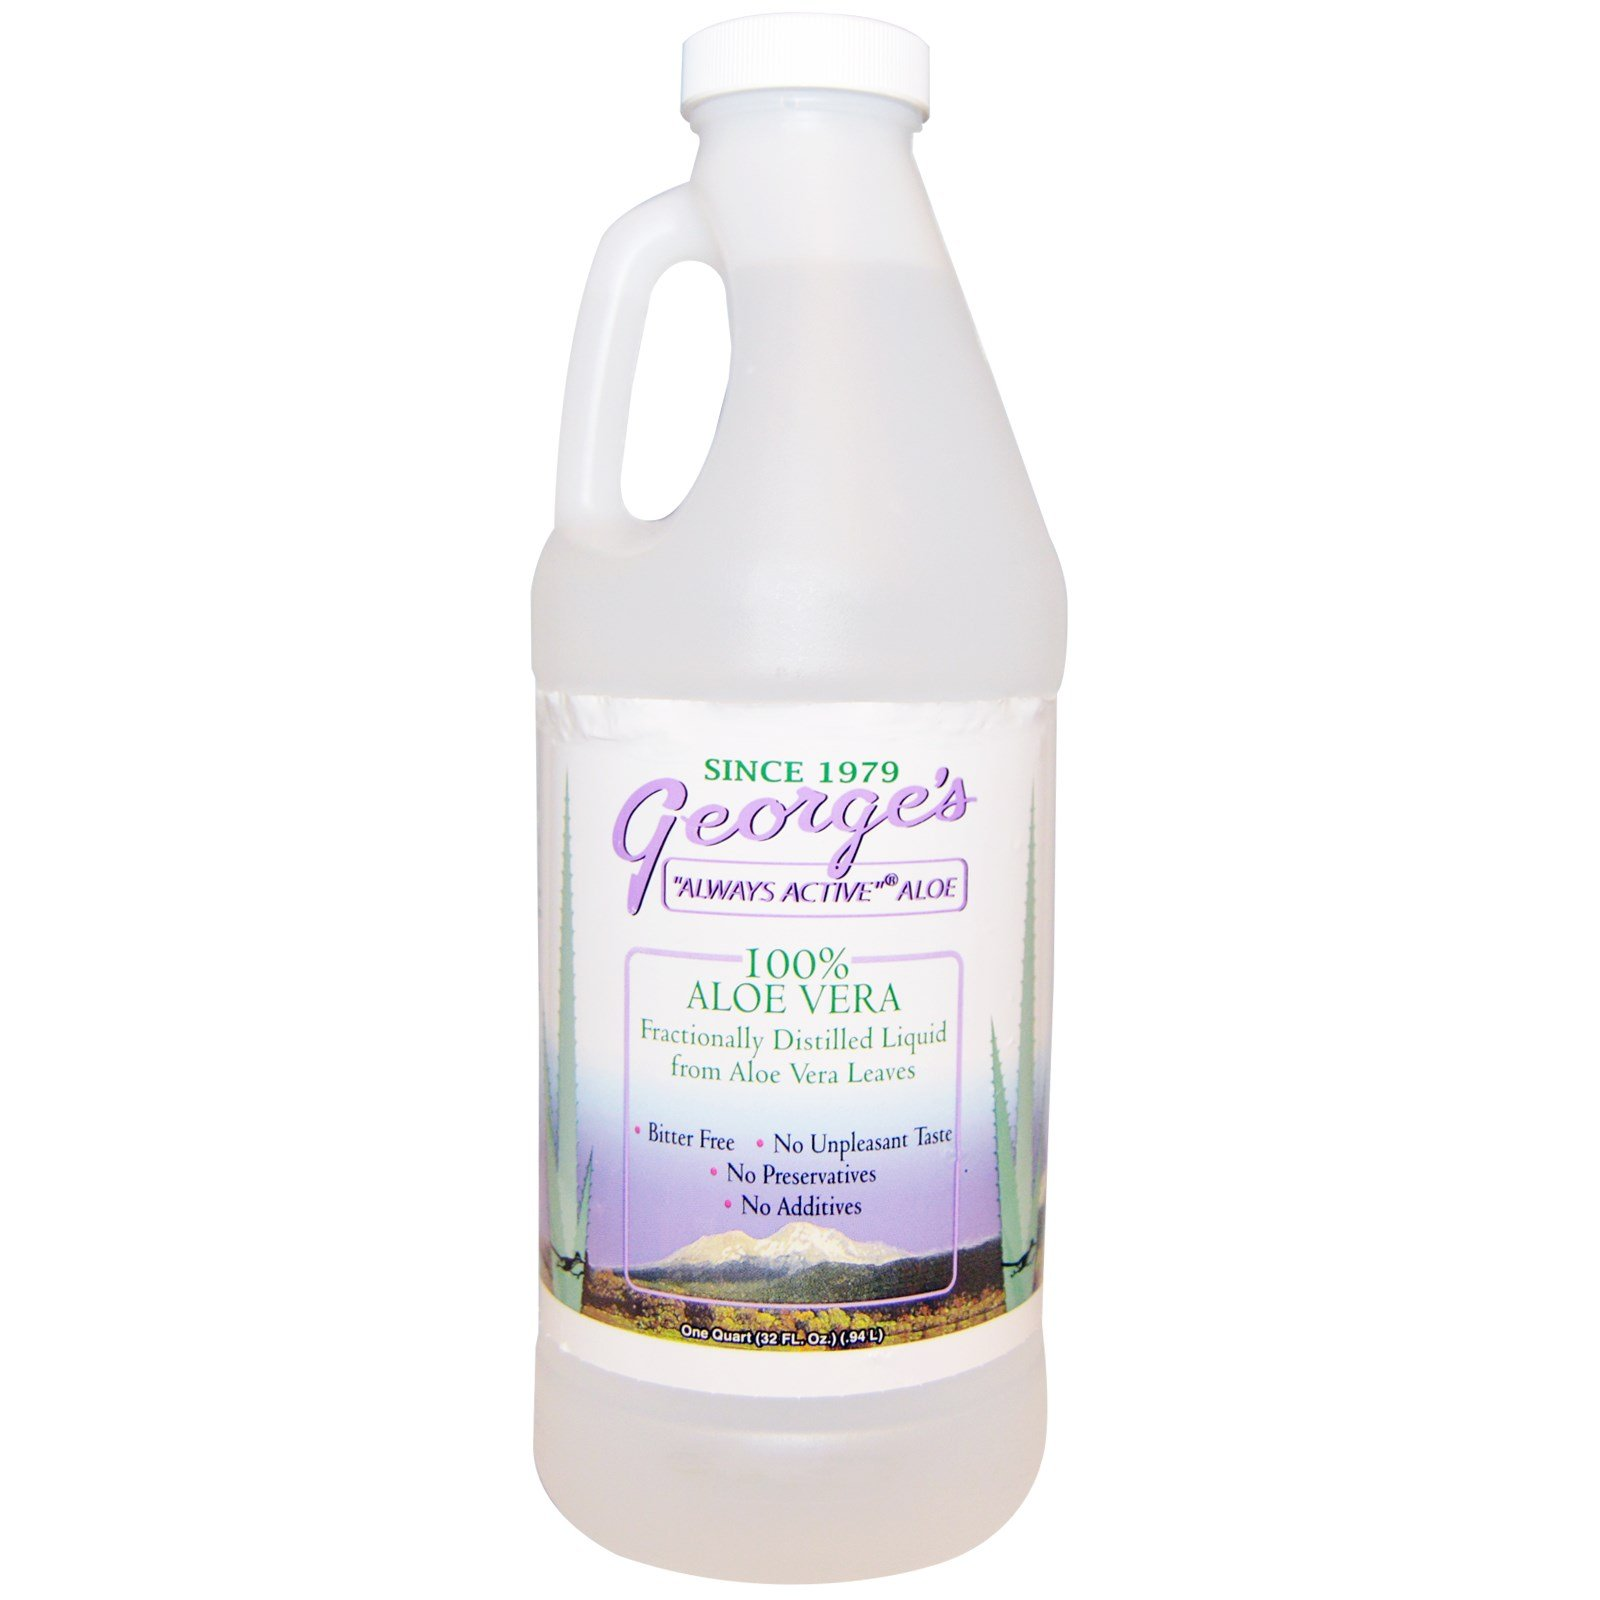 George's Aloe Vera, 100% Aloe Vera Liquid, 32 fl oz (.94 l)